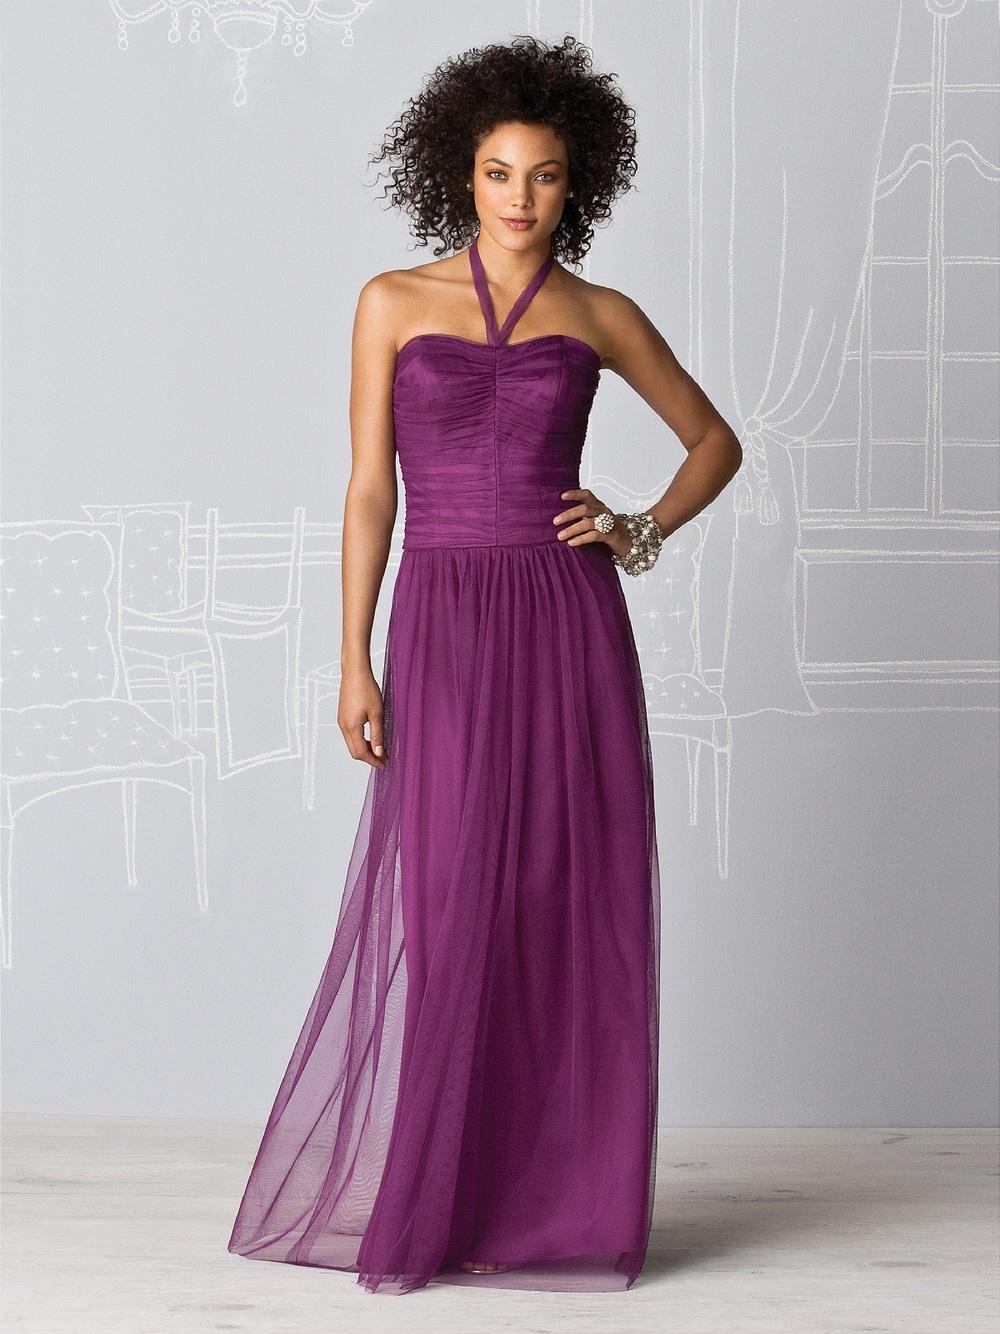 dillards bridesmaid dresses_Bridesmaid Dresses_dressesss